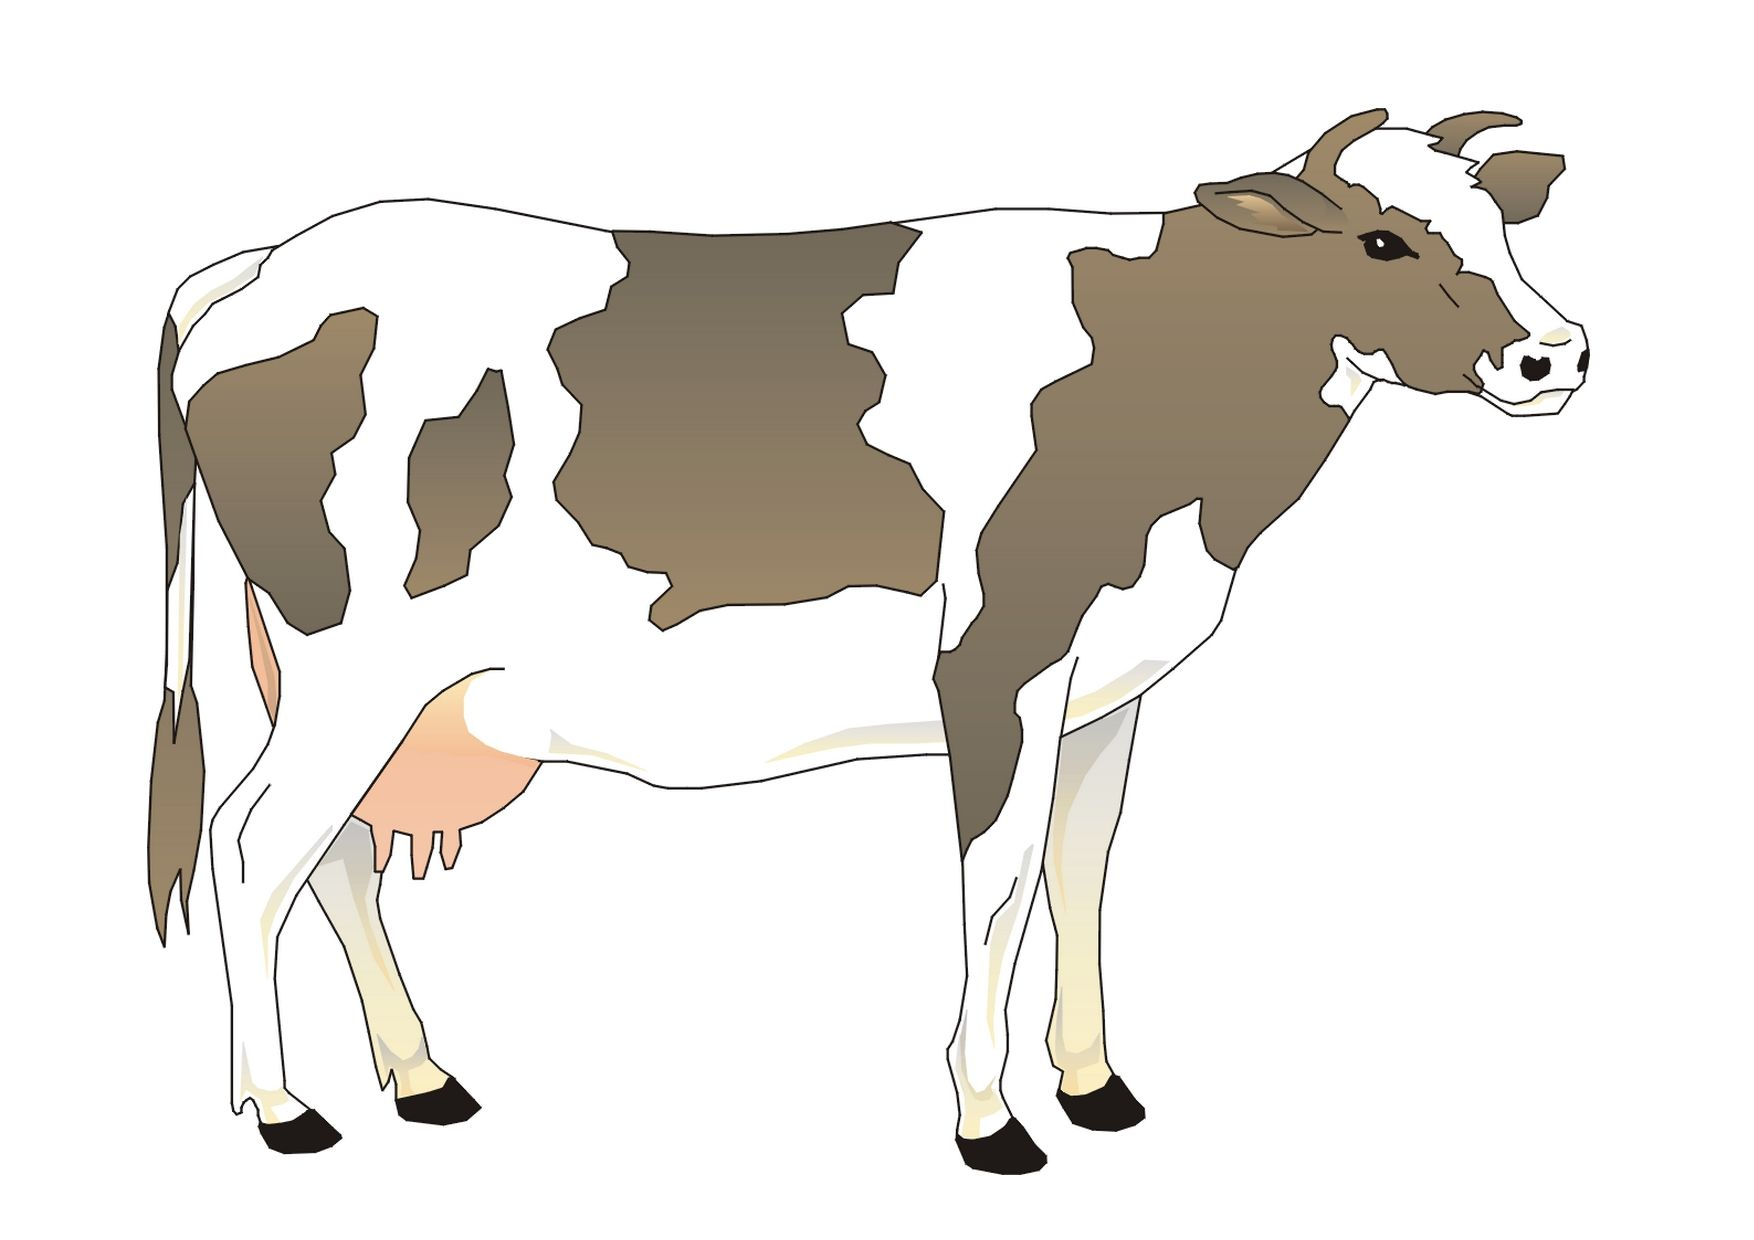 Clipart Thema Koe Kleuters Cow Theme Preschool Vaches Theme Maternelle